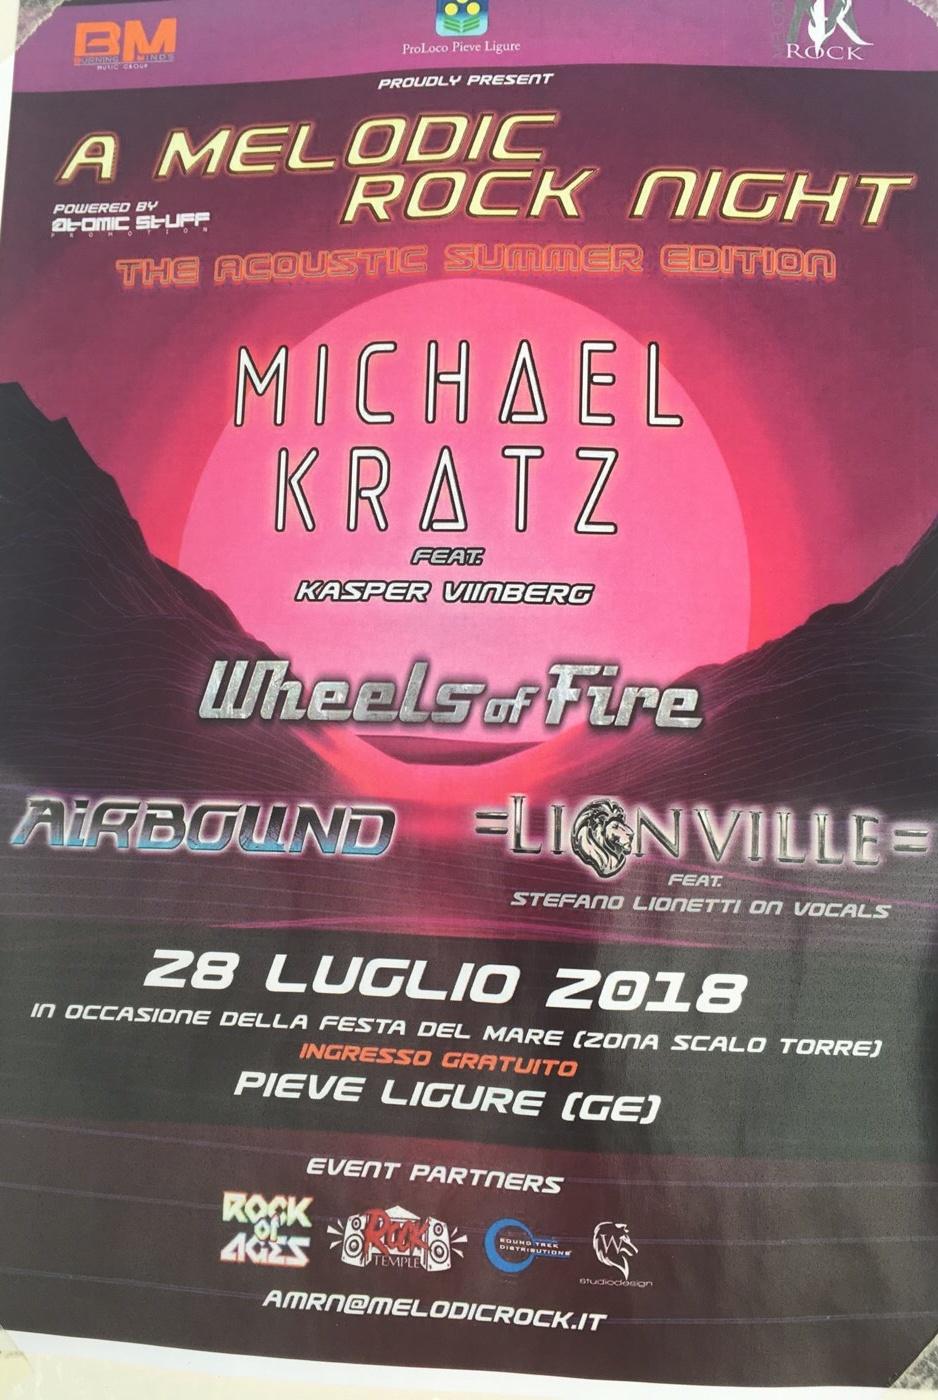 A Melodic Rock Night Scalo Torre di Pieve Ligure Piazzale la Torre, 16031 Pieve Ligure Dal 28/07/2018 Al 28/07/2018 20:00 - 02:00